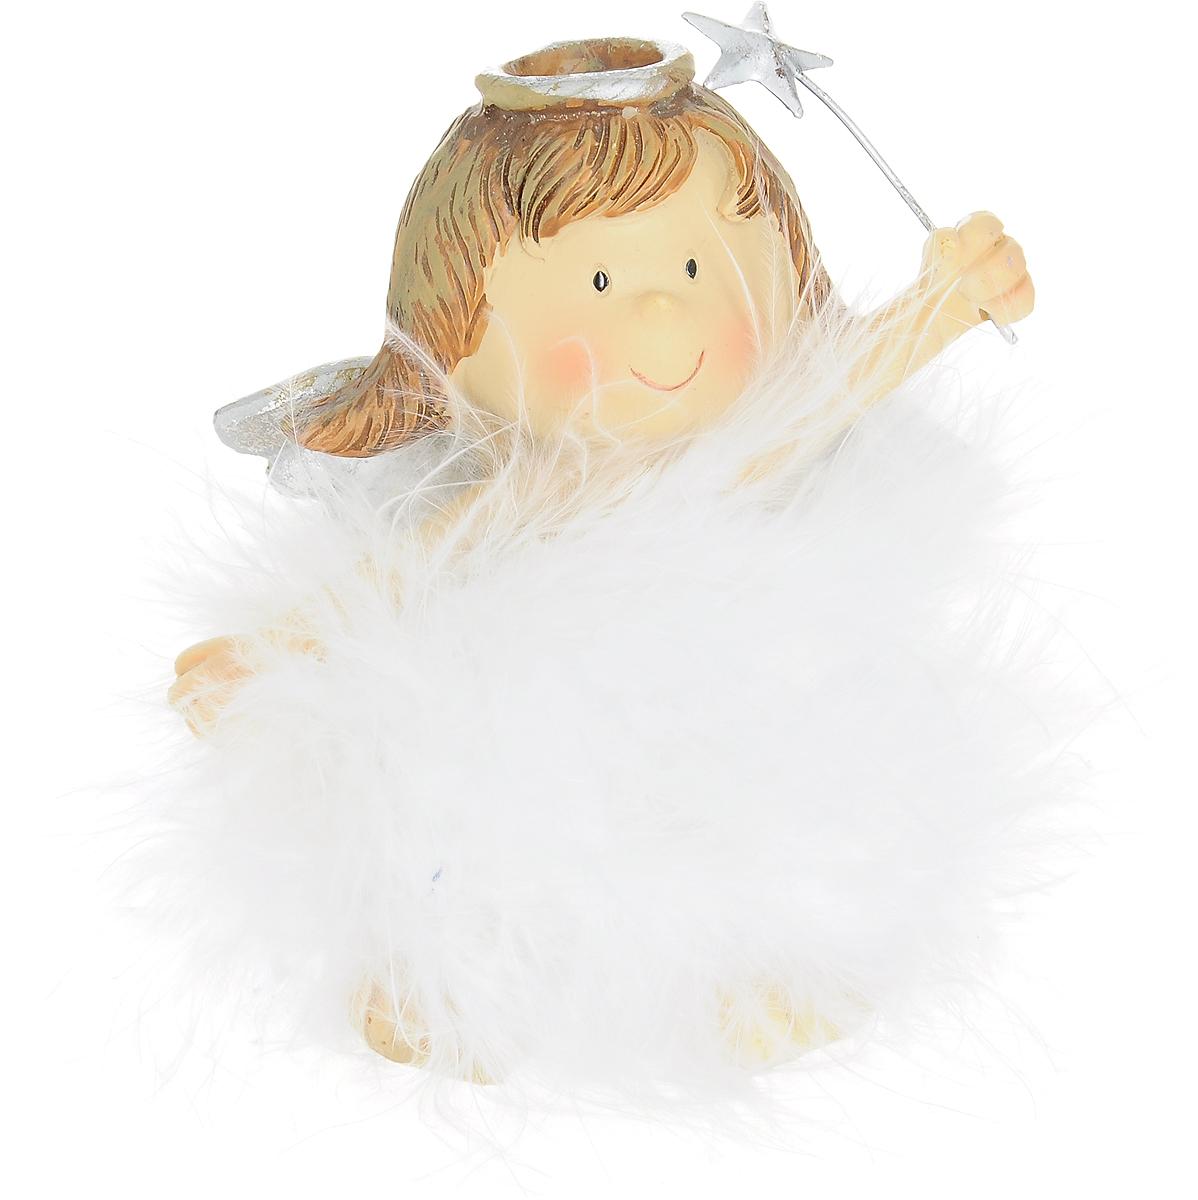 Фигурка декоративная Ангелочек, 8 х 4 х 10 см массажная палочка шунгит 8 10 см